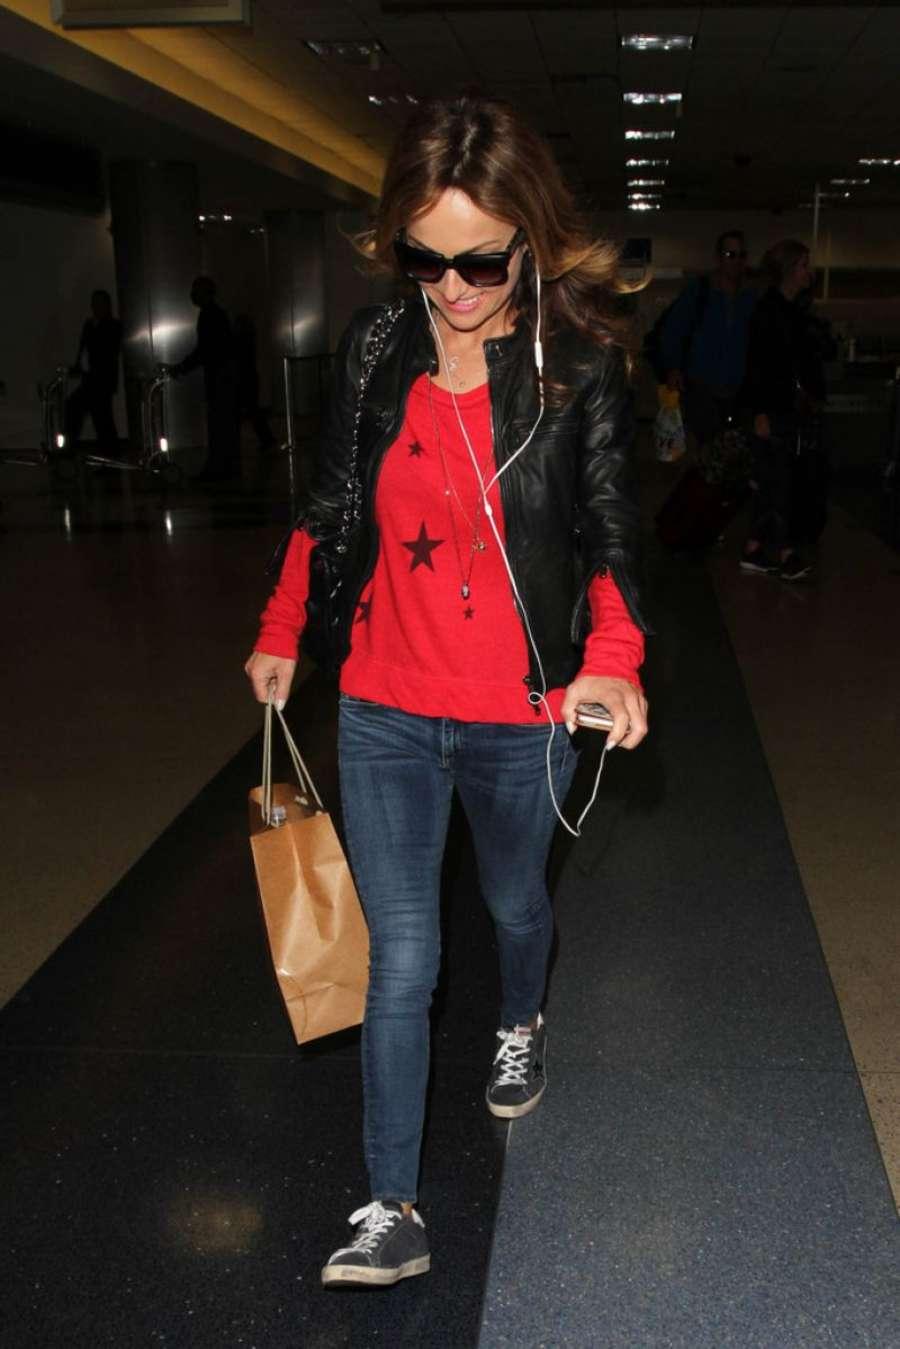 Giada De Laurentiis Arrives at LAX Airport in Los Angeles